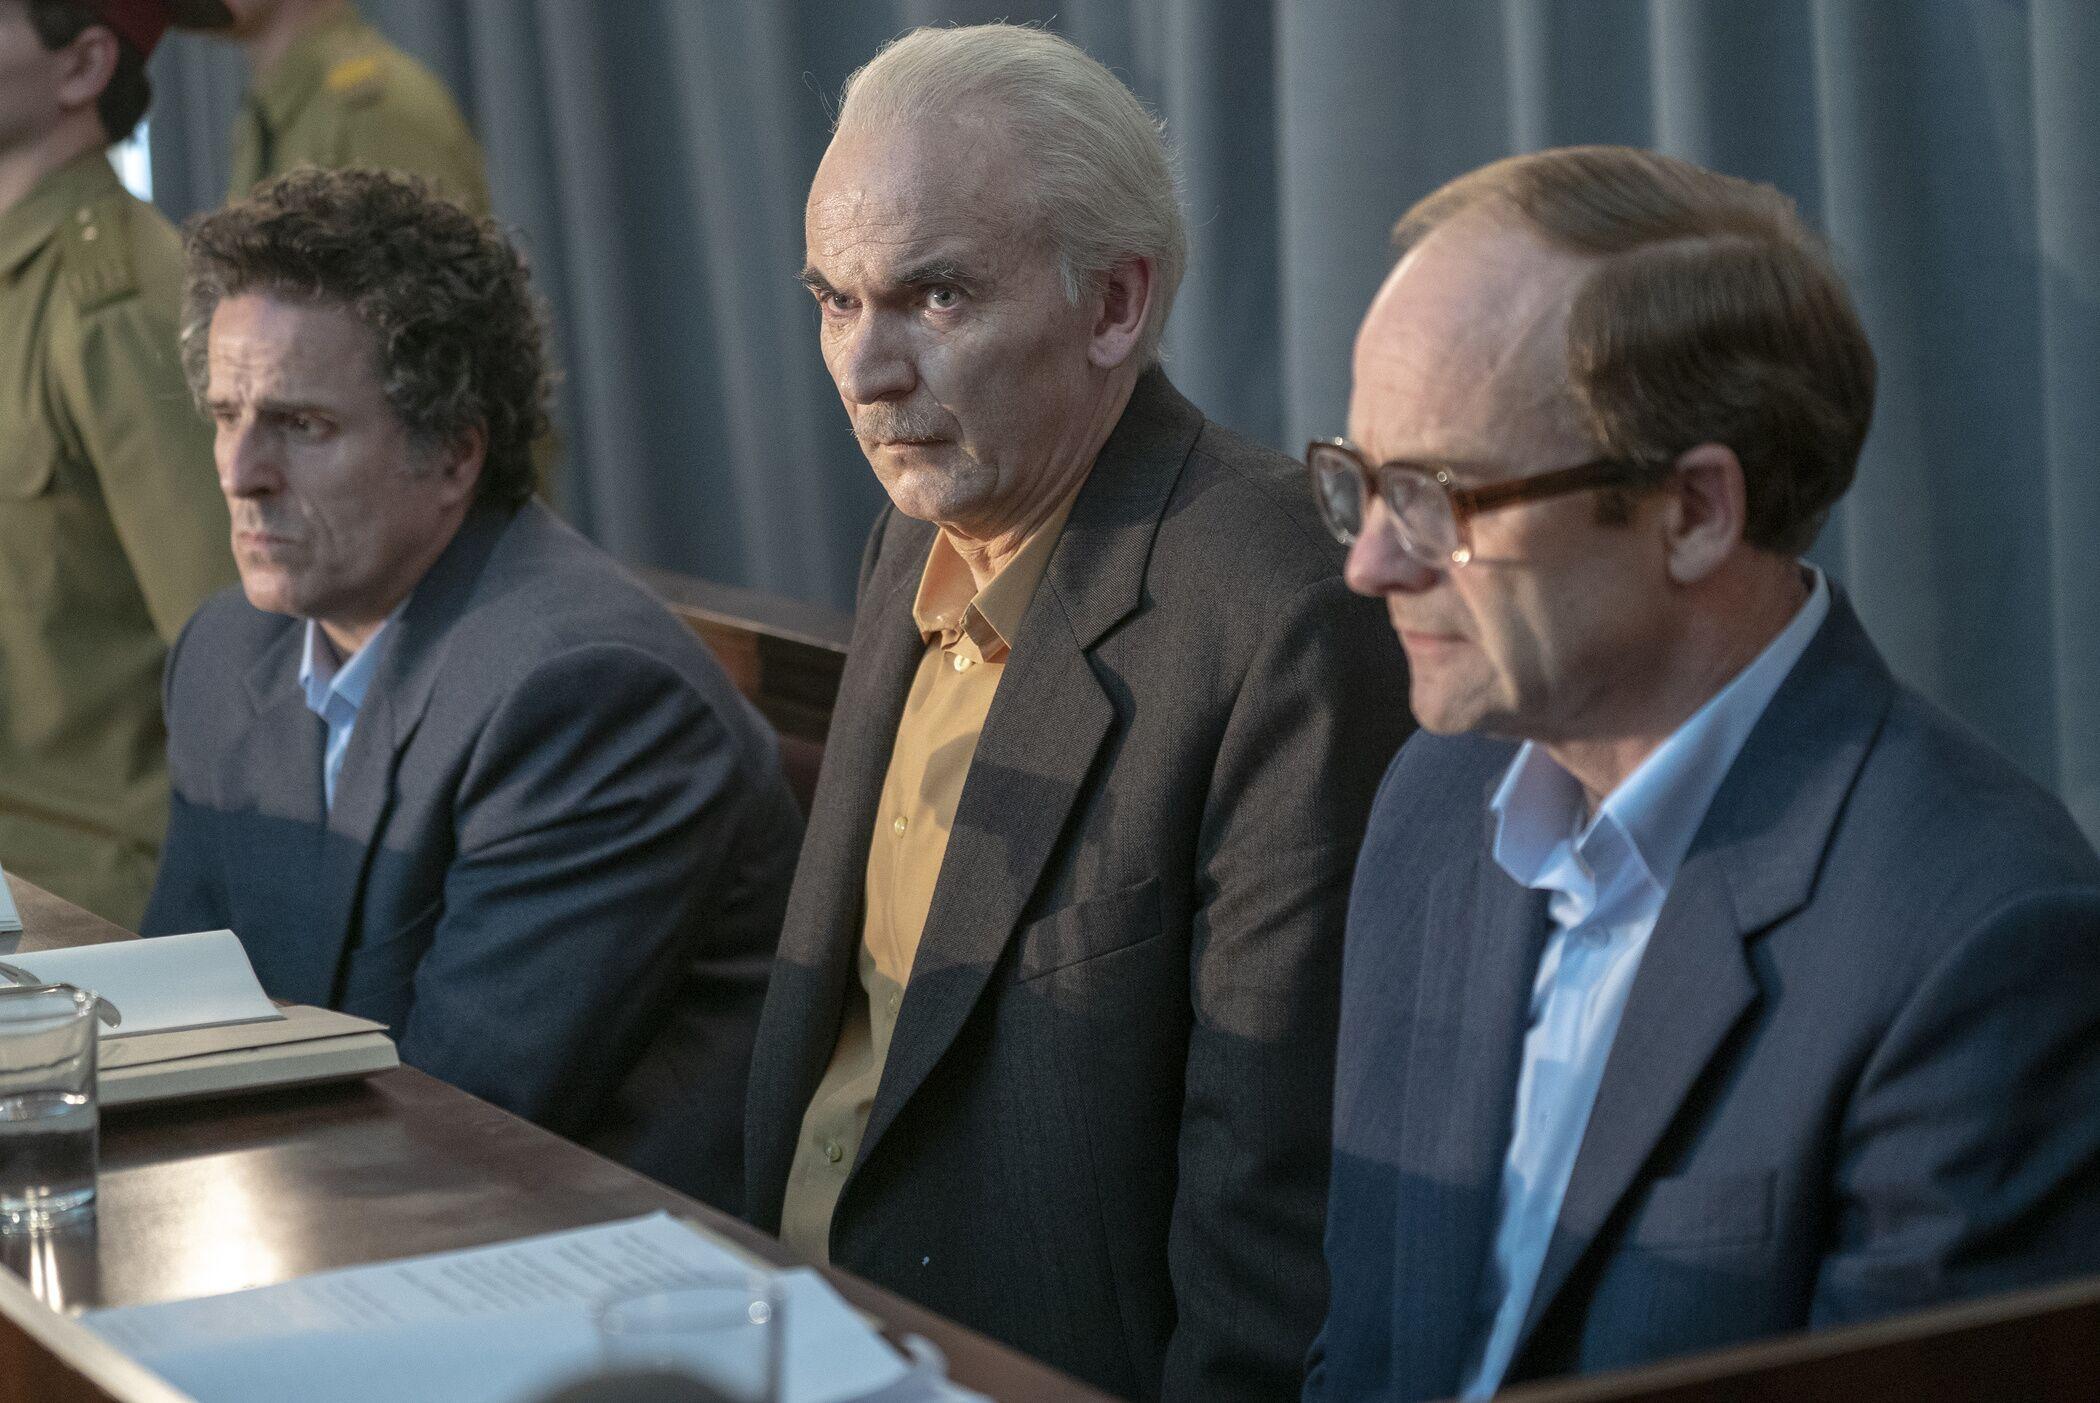 By Photo Congress || Hbo Chernobyl Cast Akimov